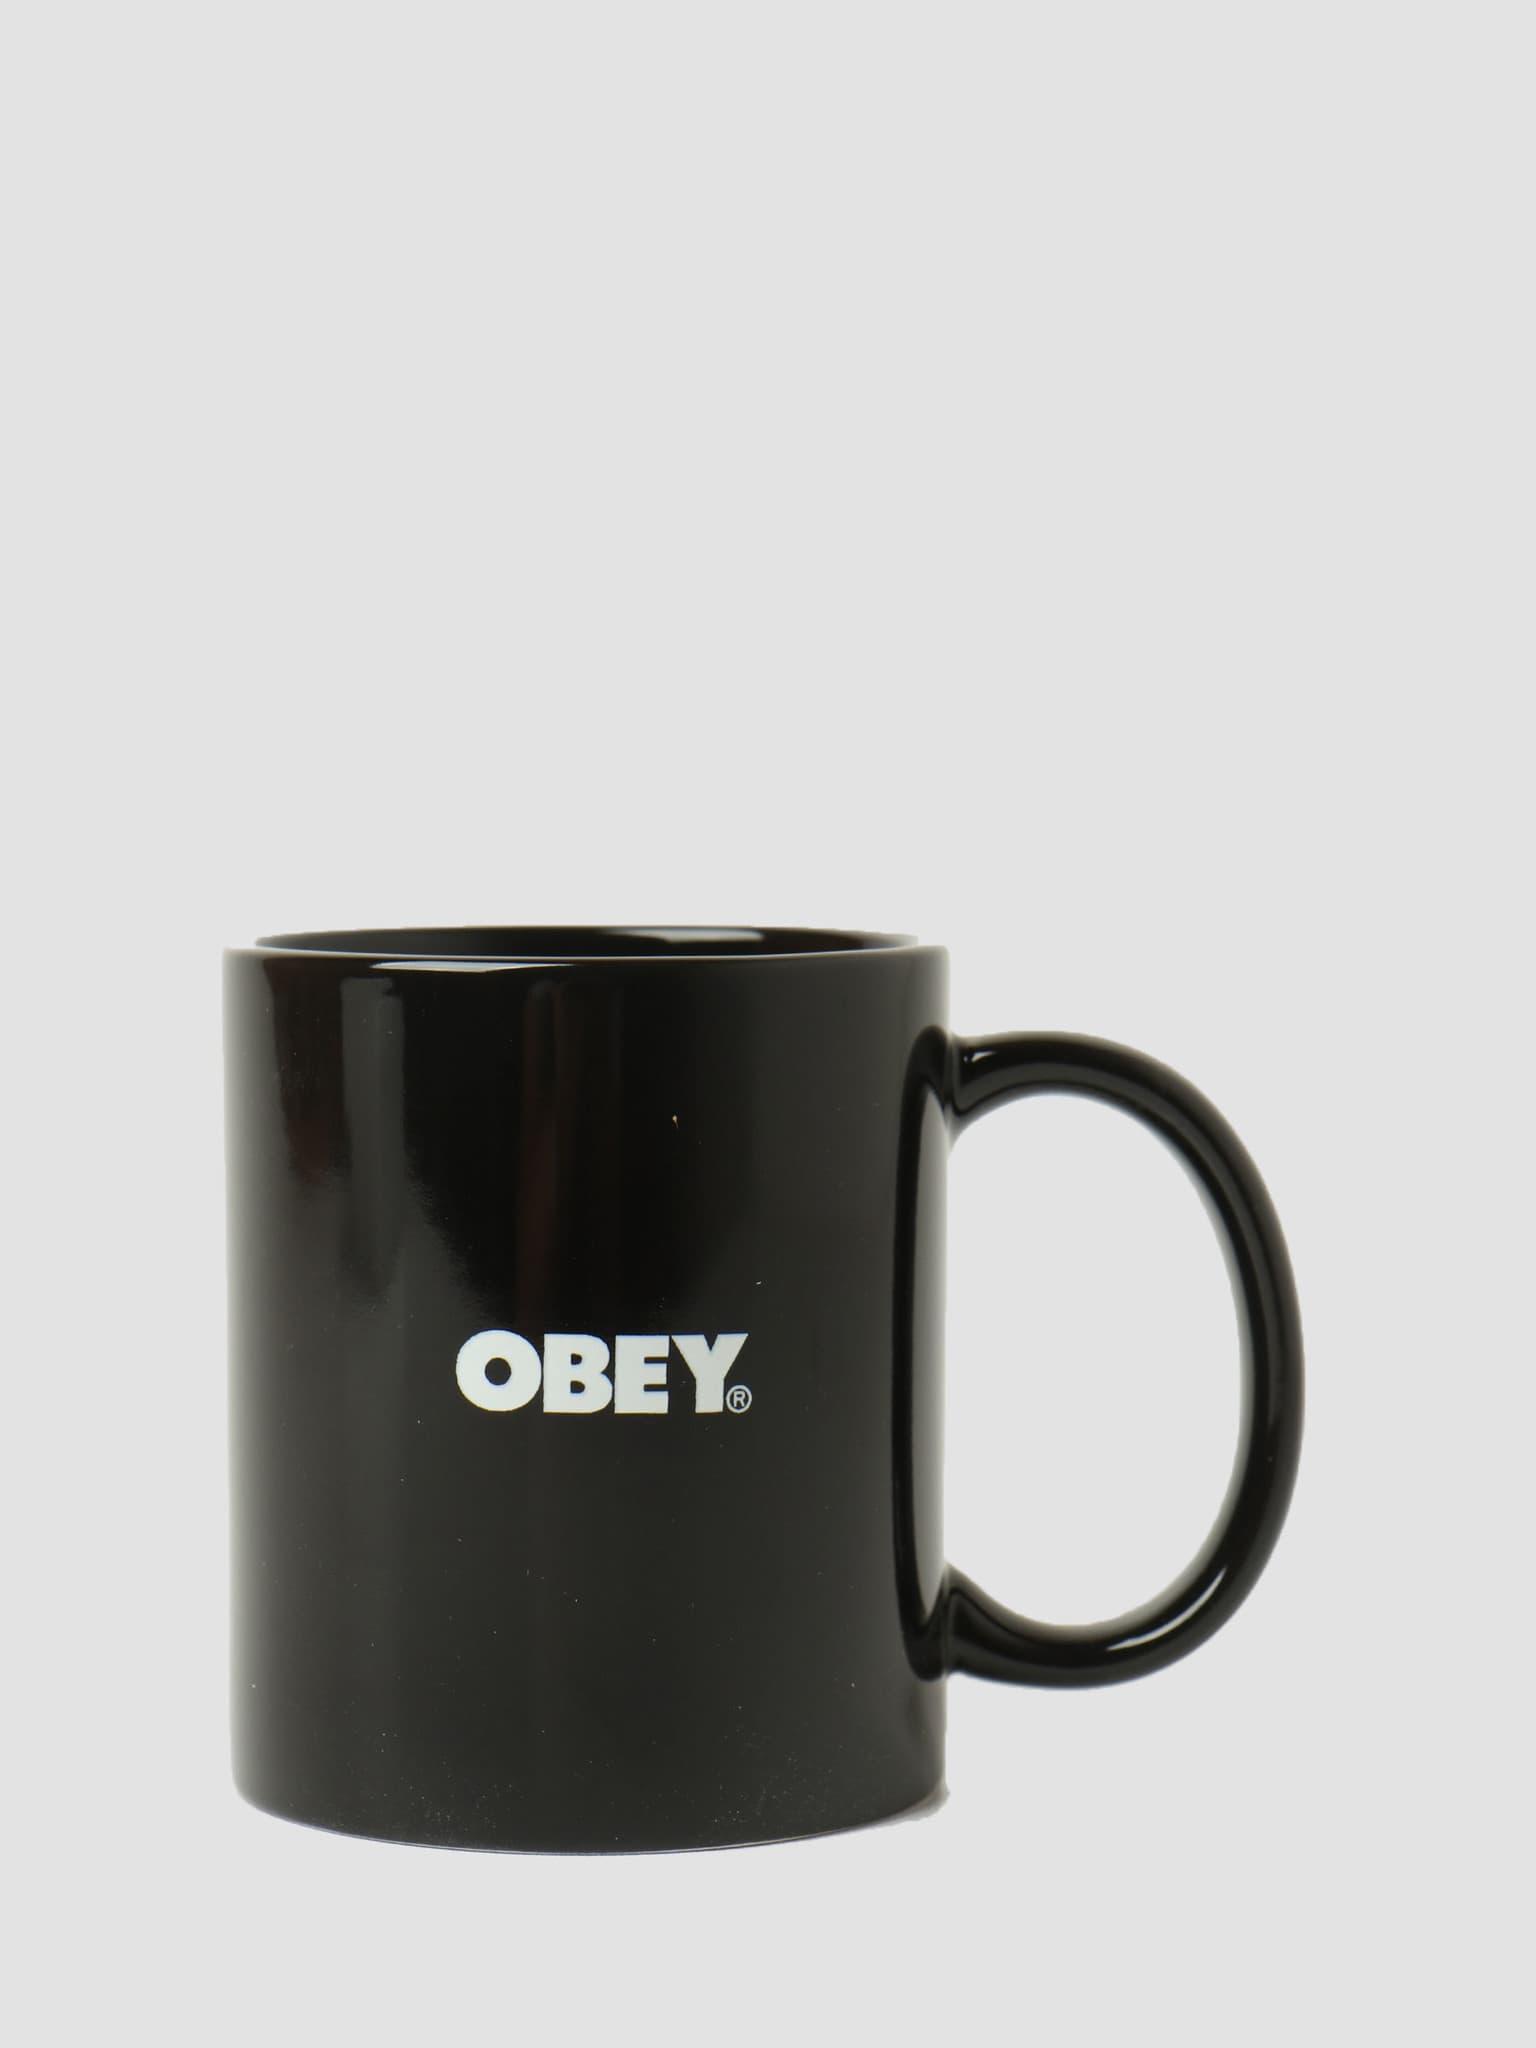 Protest Mug Coffee Mug Black White 100630002